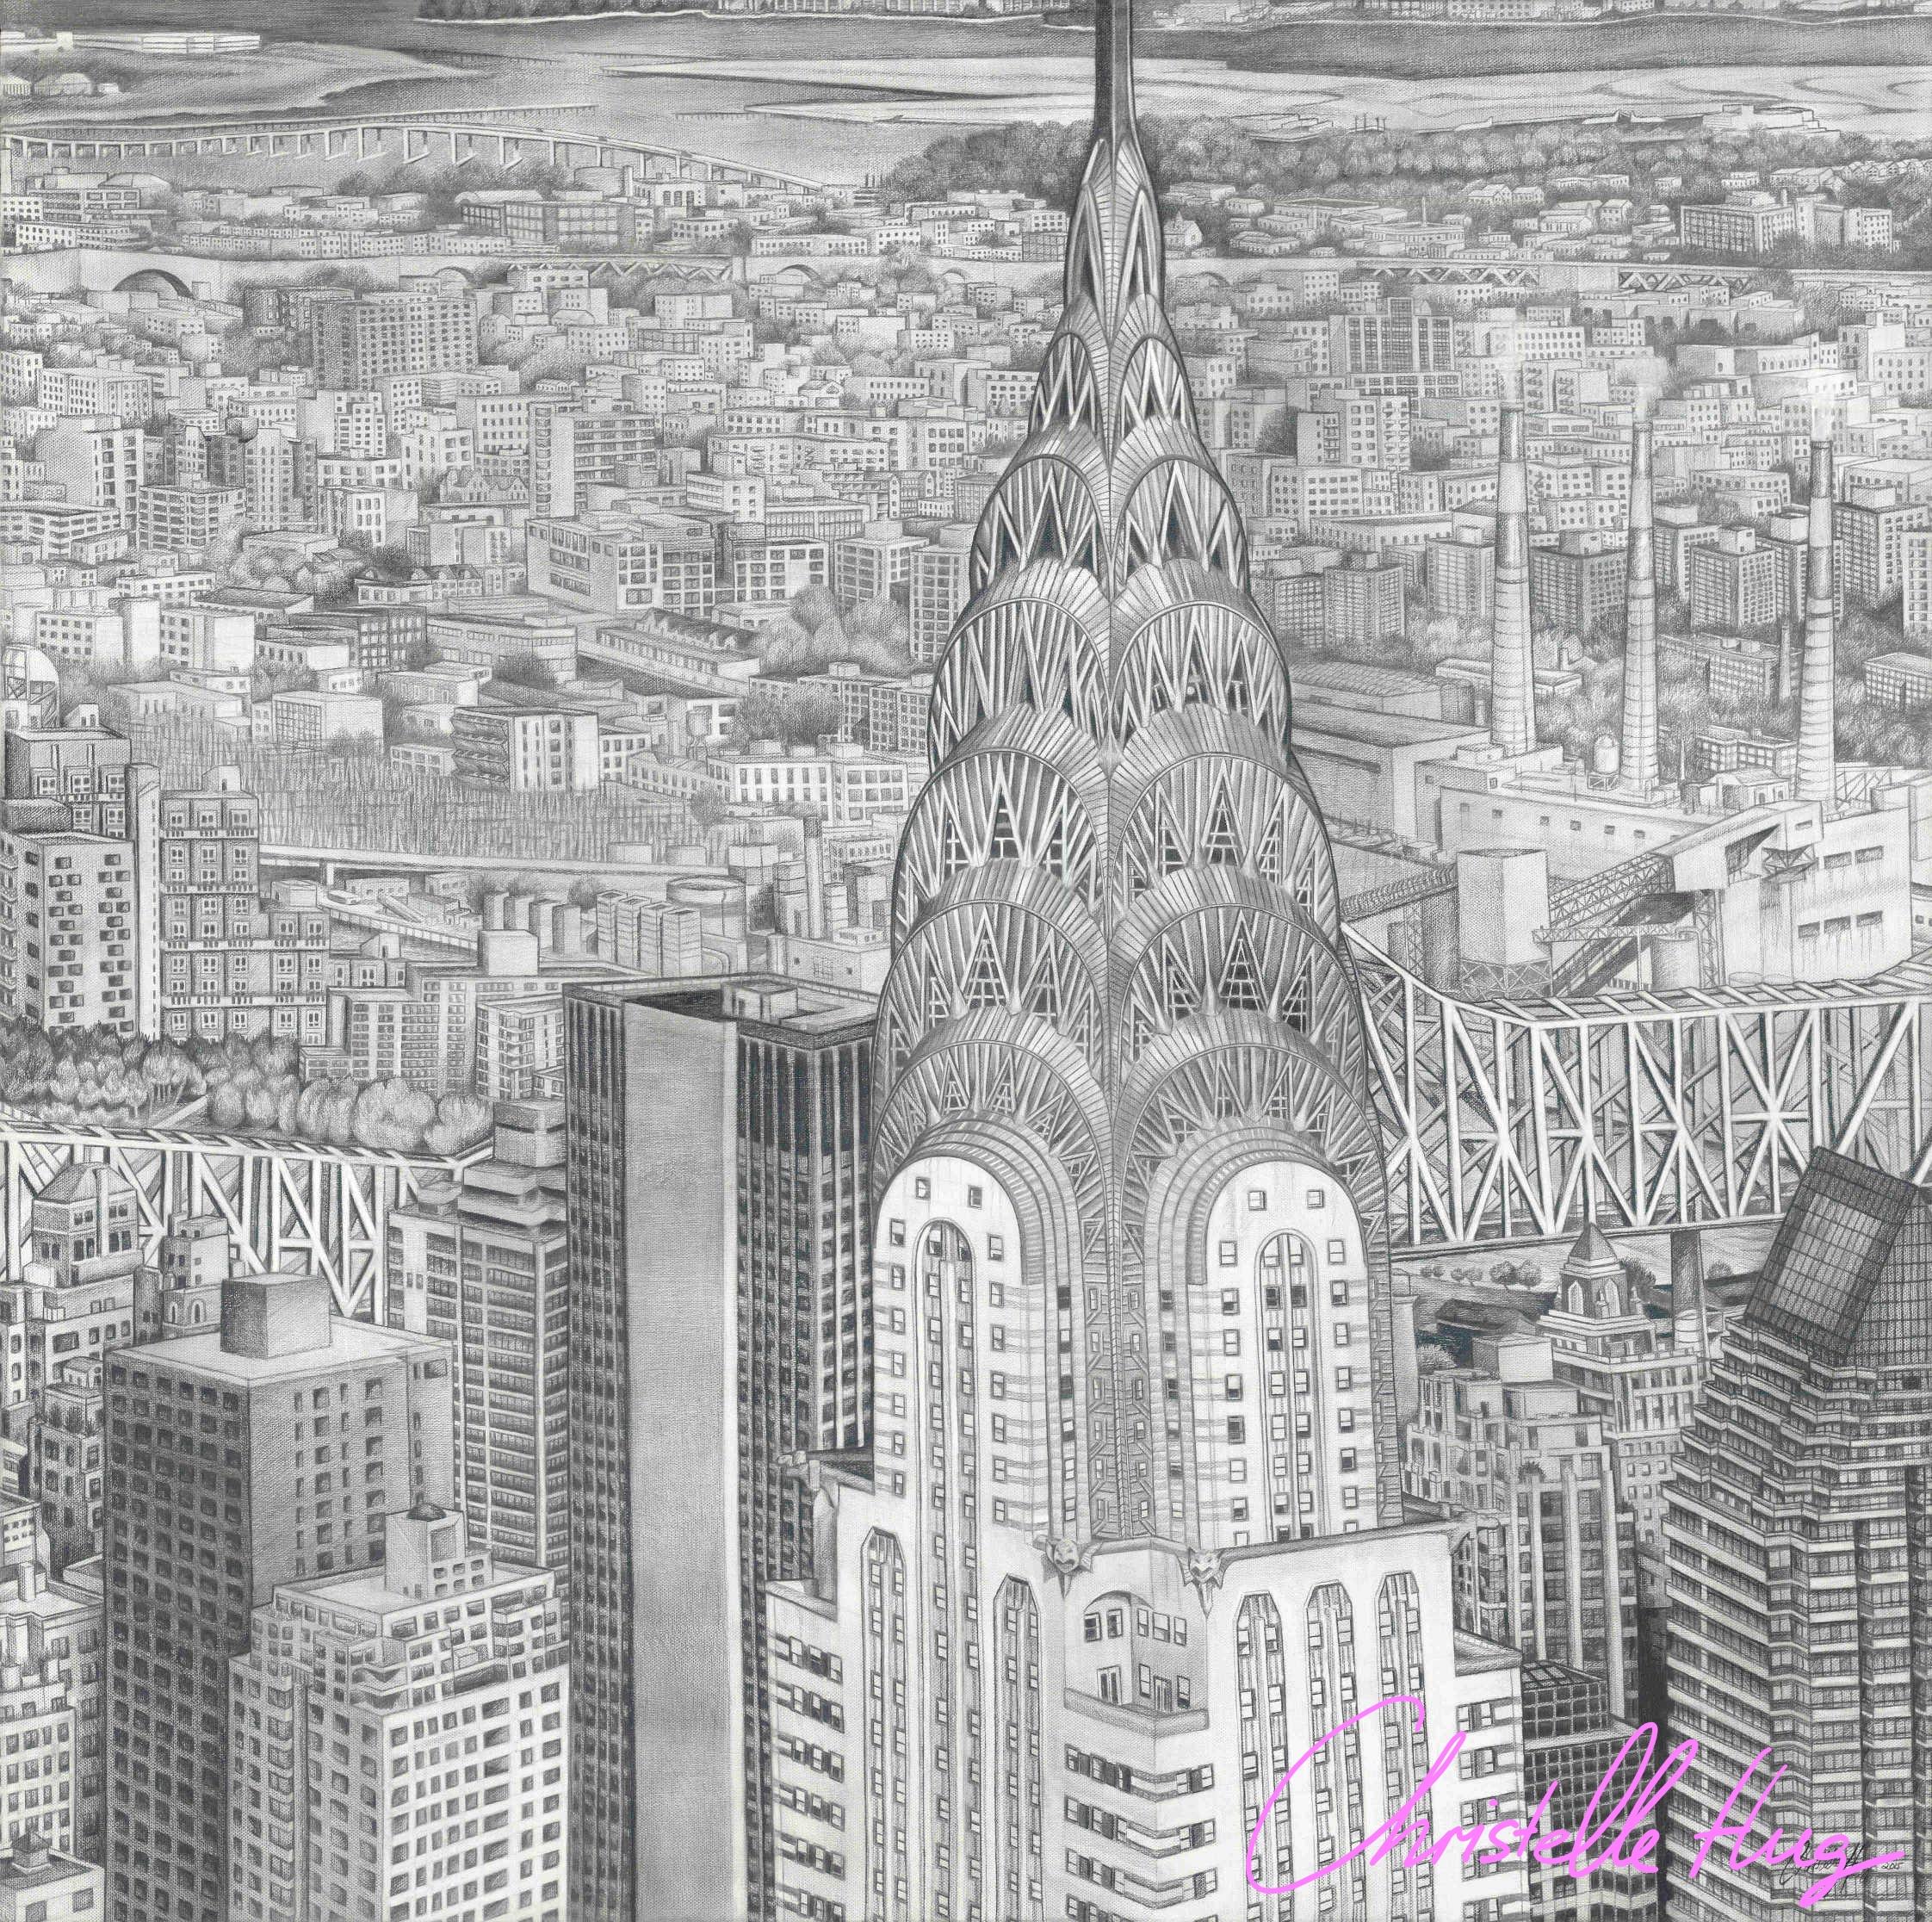 NYC_1.jpg